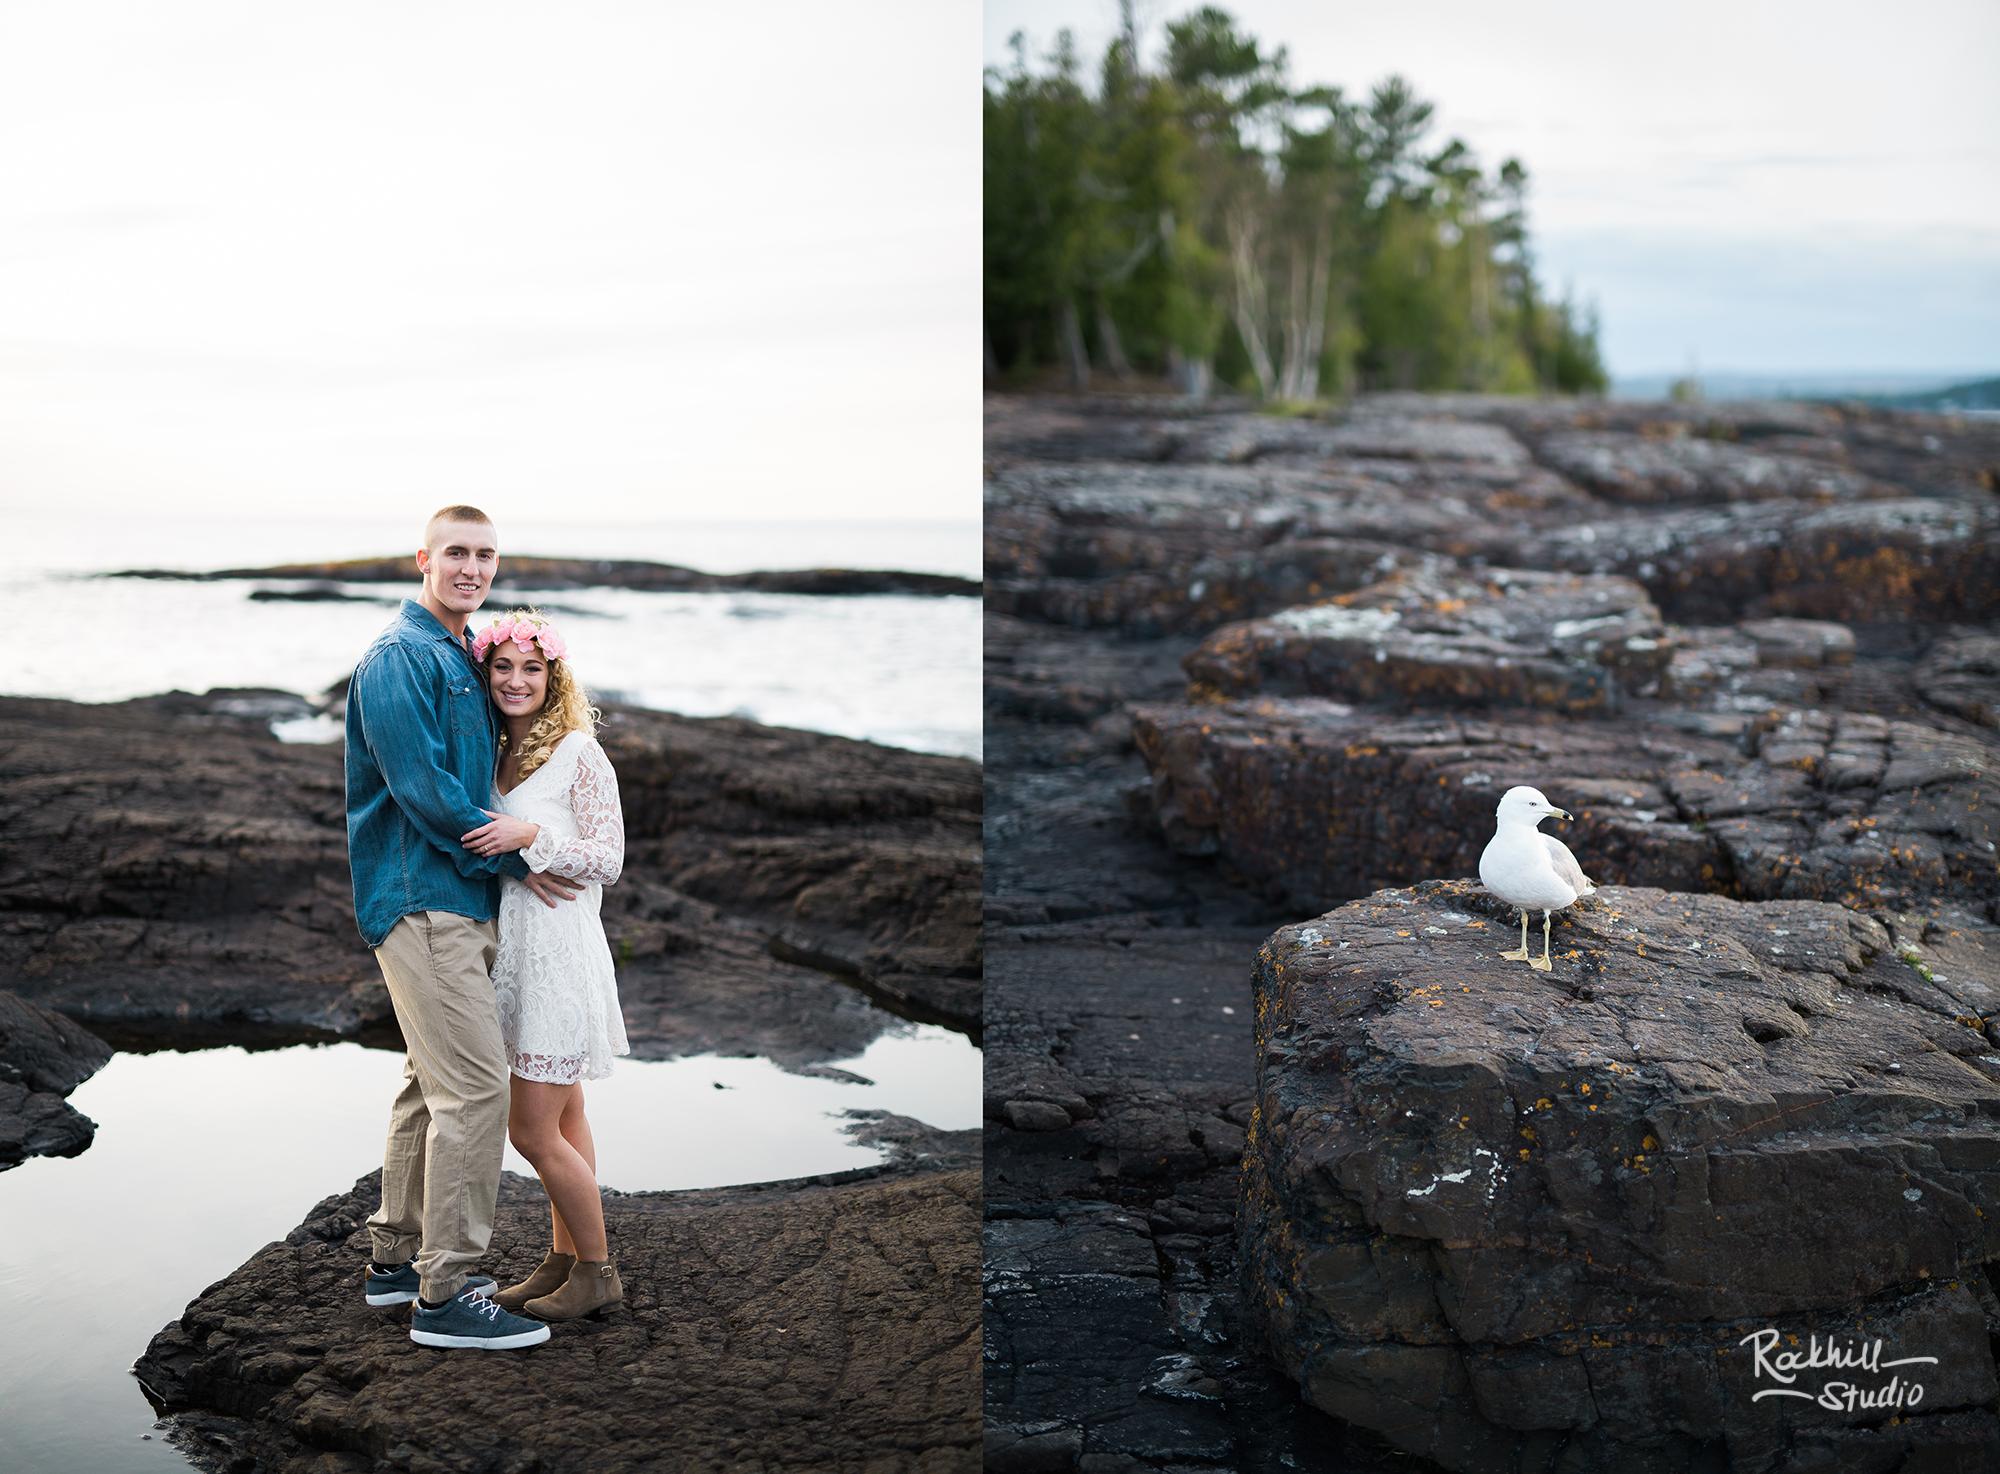 marquette-michigan-wedding-photography-rockhill-presque-isle-upper-peninsula-michigan-haley-34.jpg